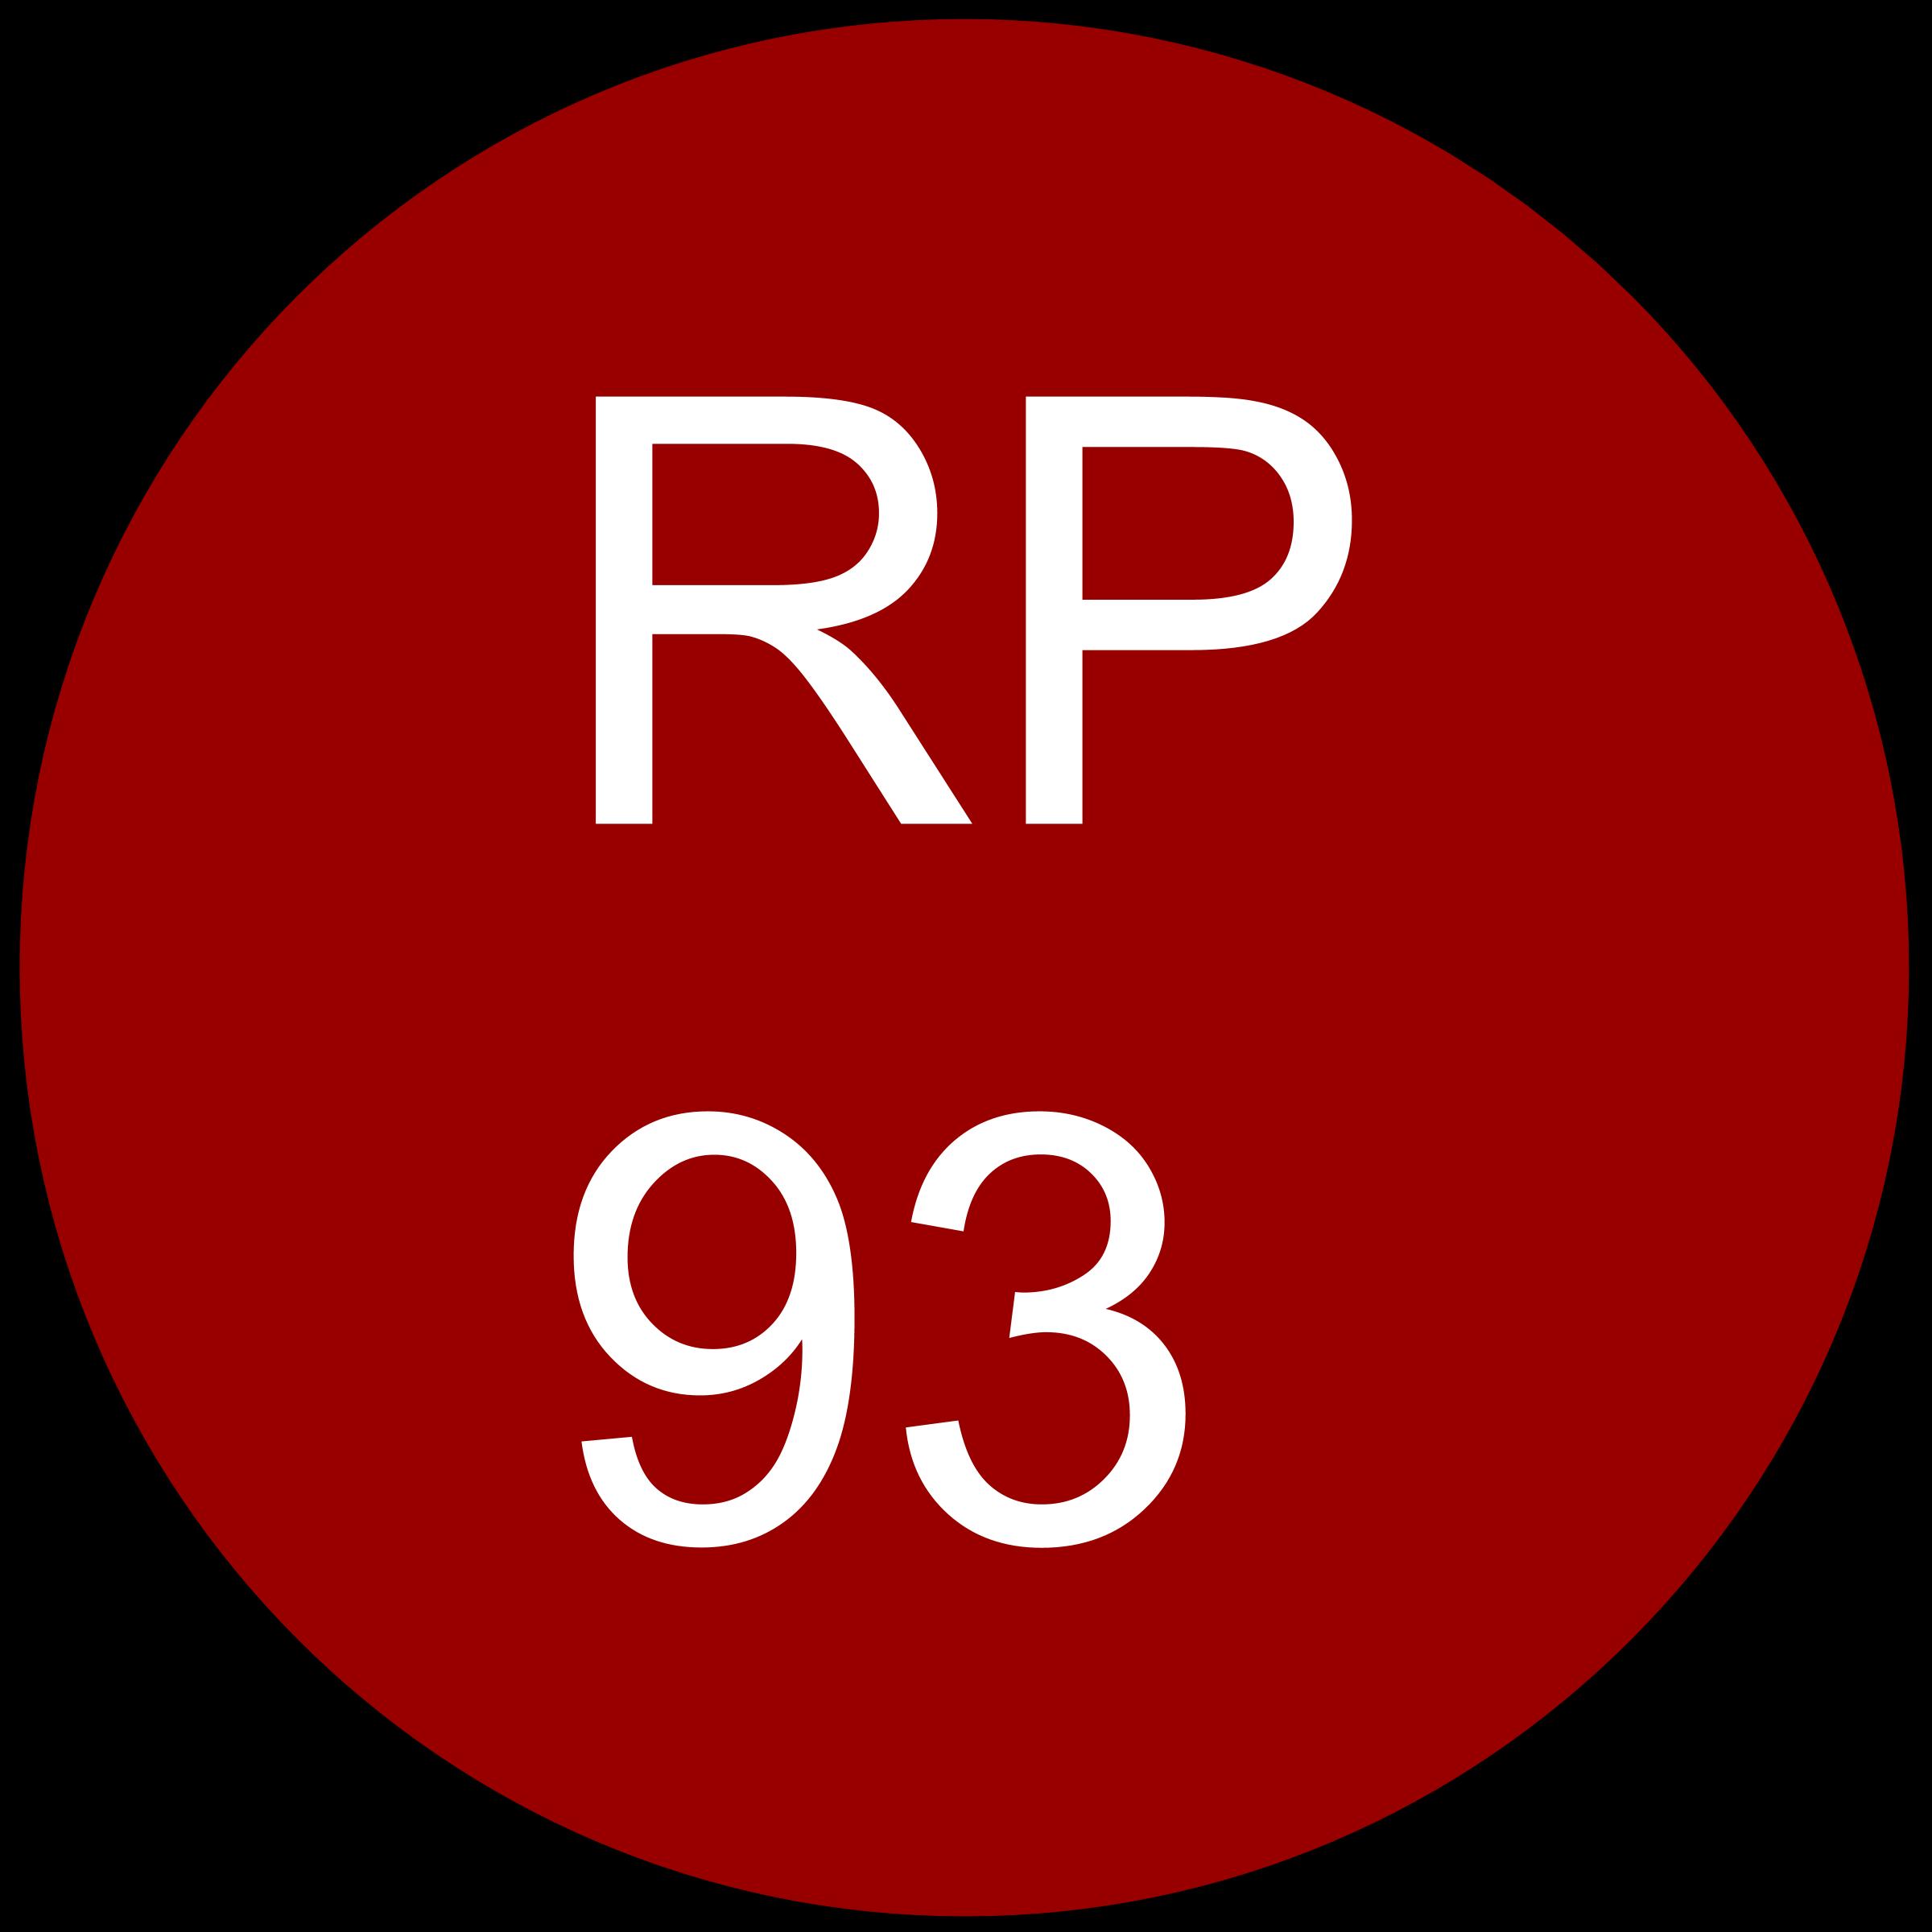 robert-parkers-wine-advocate-93-ratings